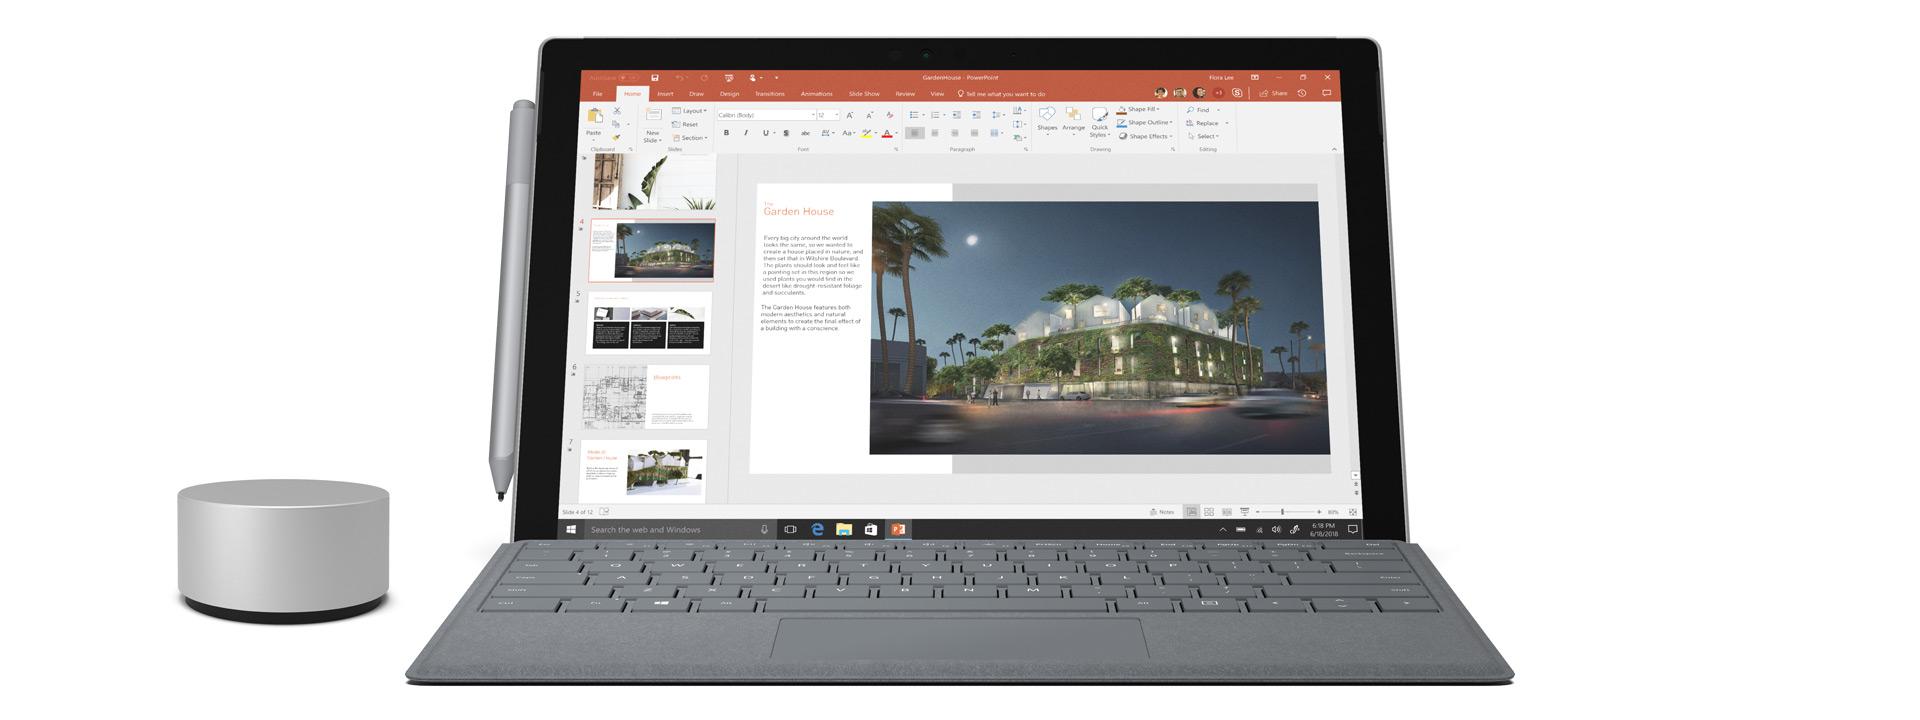 Surface Pro avec clavier Signature Type Cover pour Surface Pro, stylet Surface et Surface Dial.